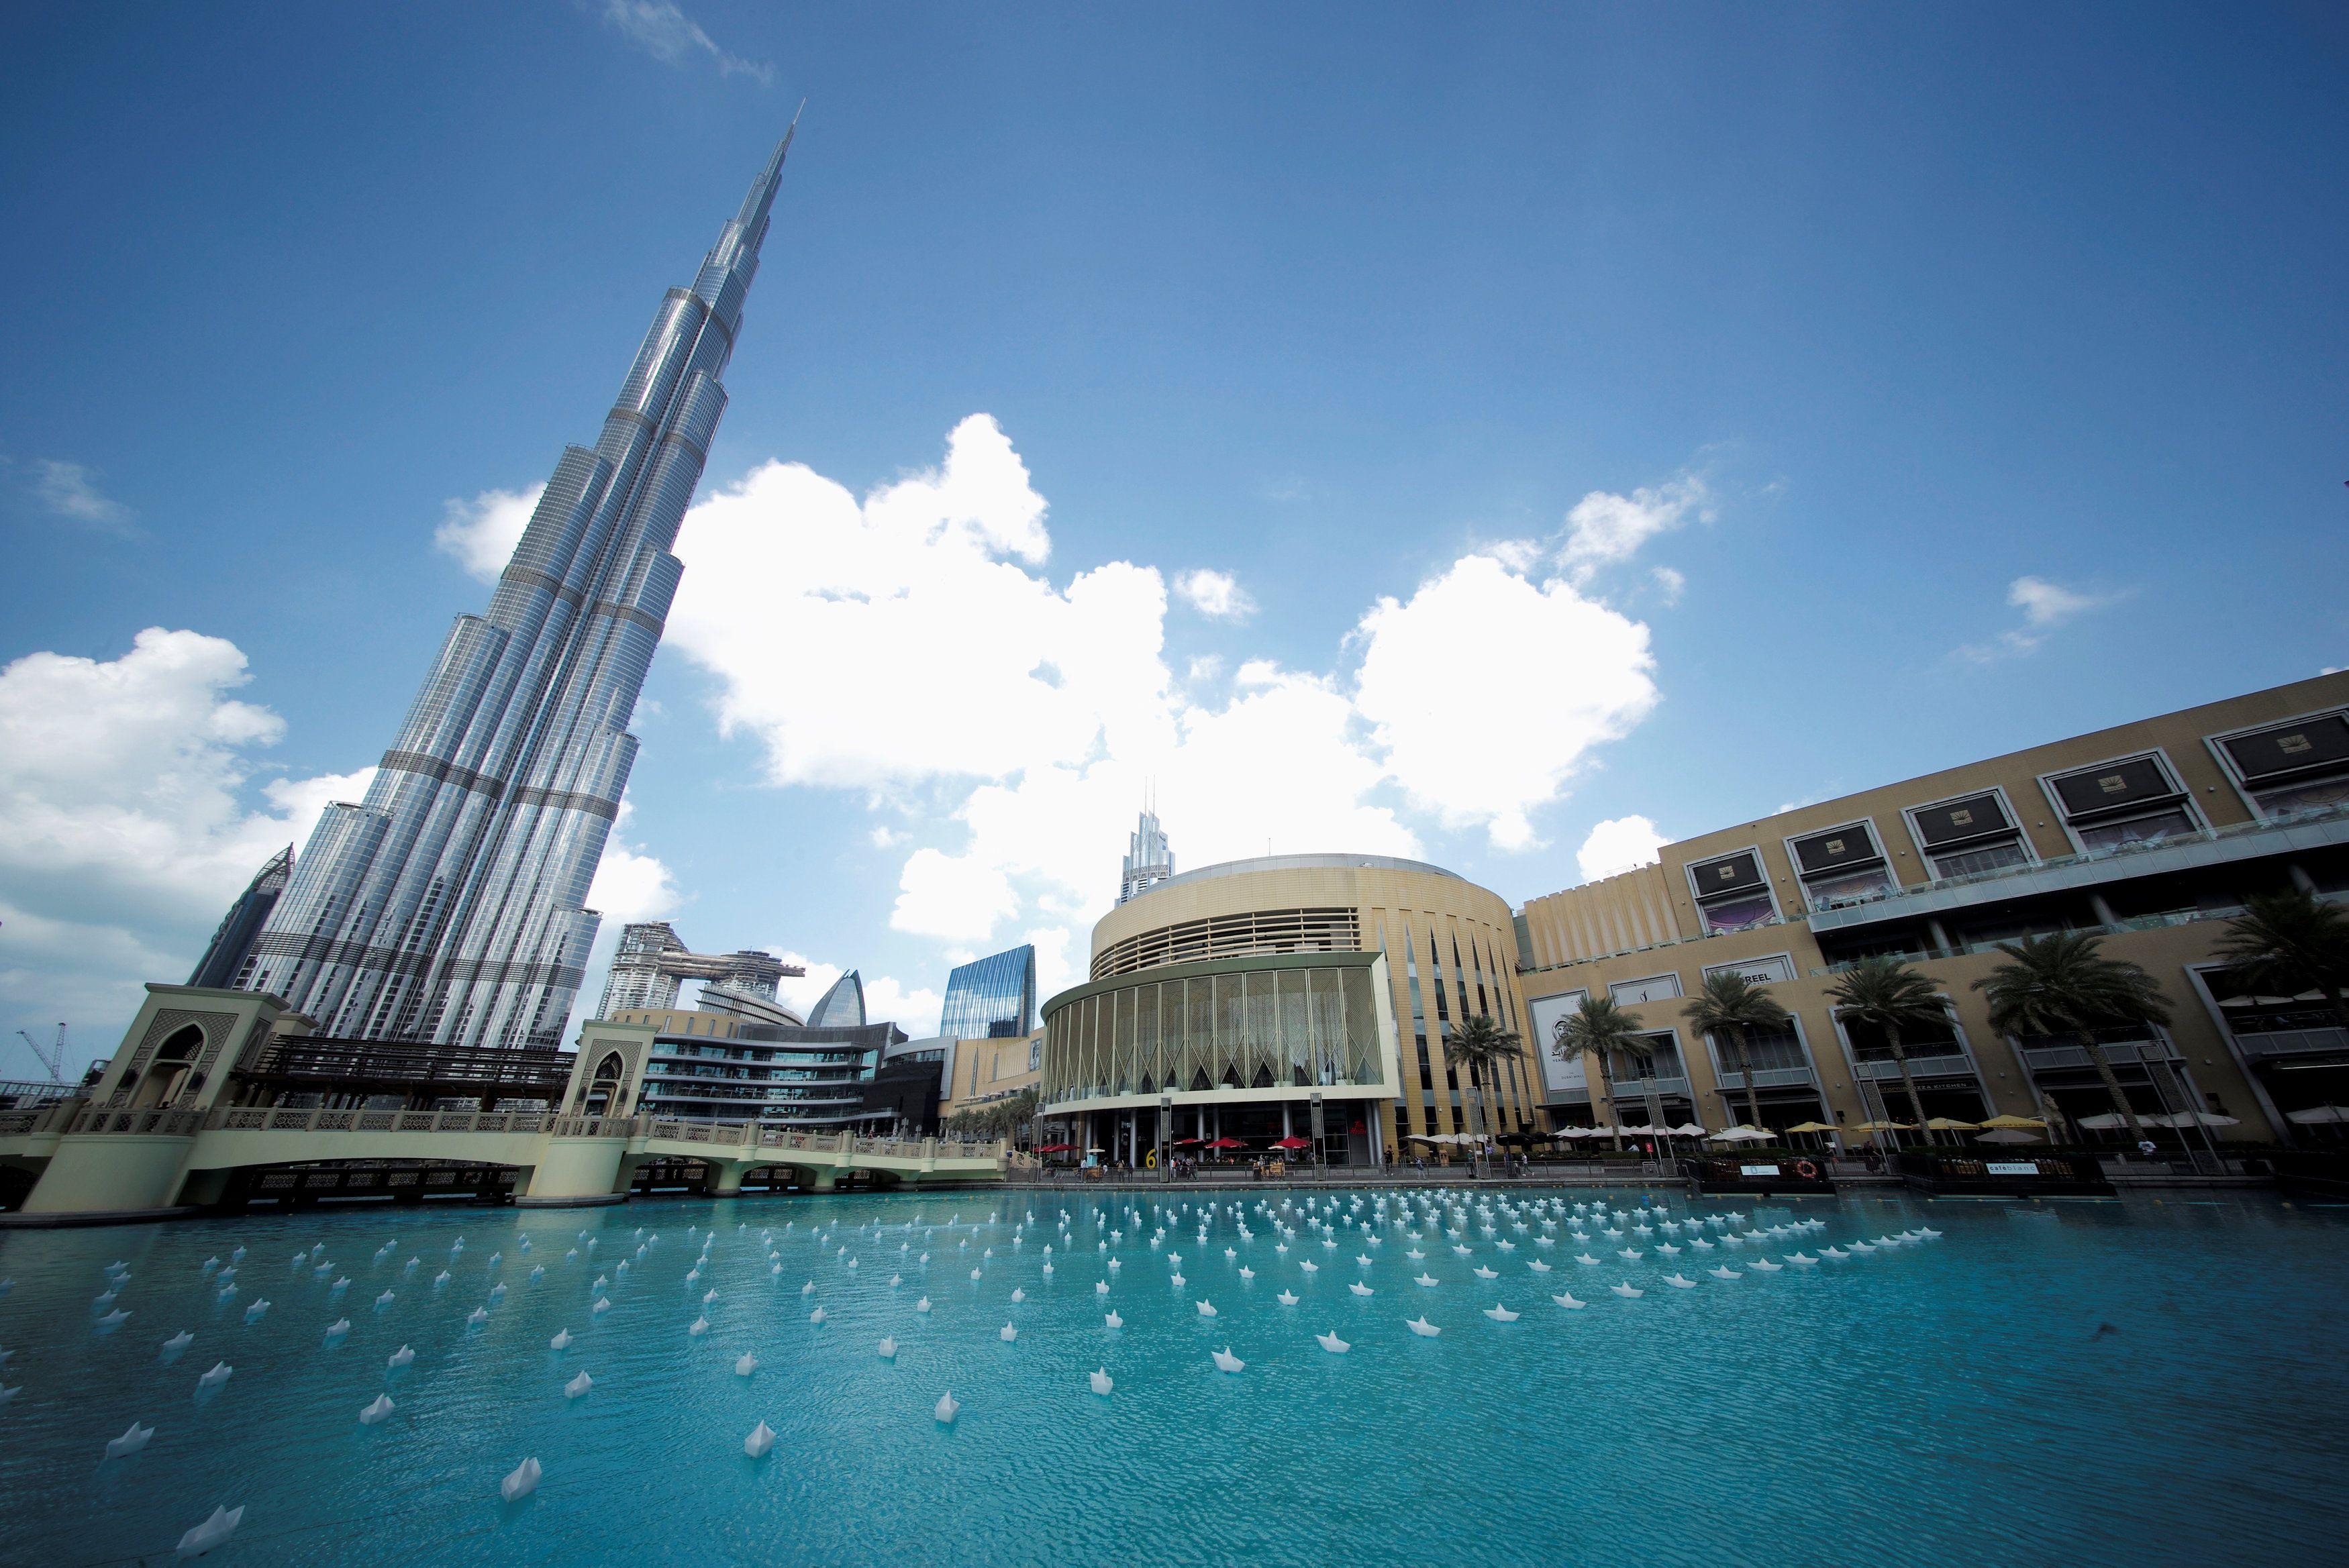 Vista general del edificio Burj Khalifa y Dubai Mall en Dubai, Emiratos Árabes Unidos (REUTERS/ Hamad I Mohammed)